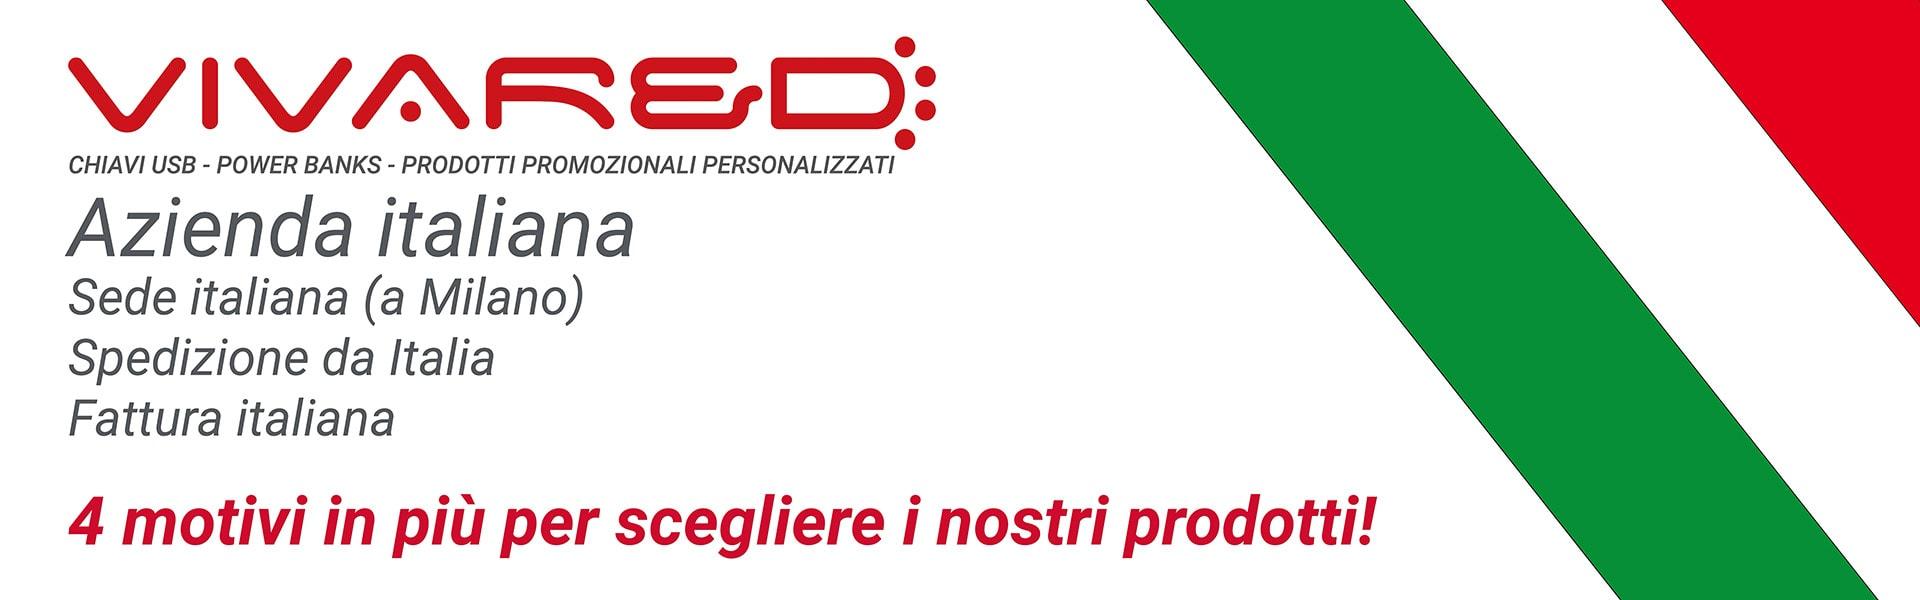 Banner-azienda-italiana2